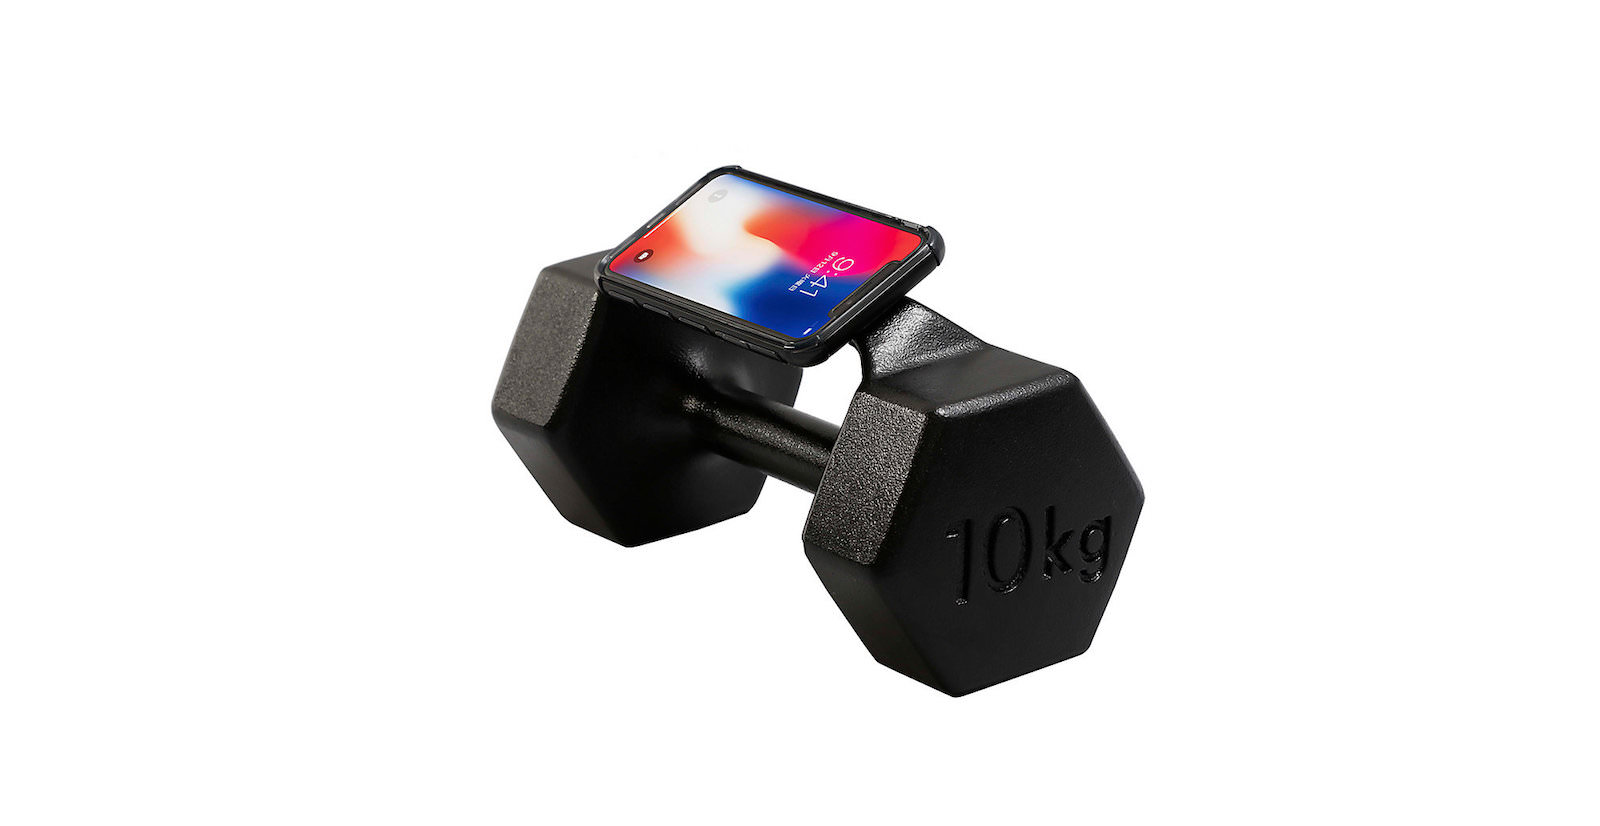 10kg-iphone-case-softbank-npcj-collaboration.jpeg